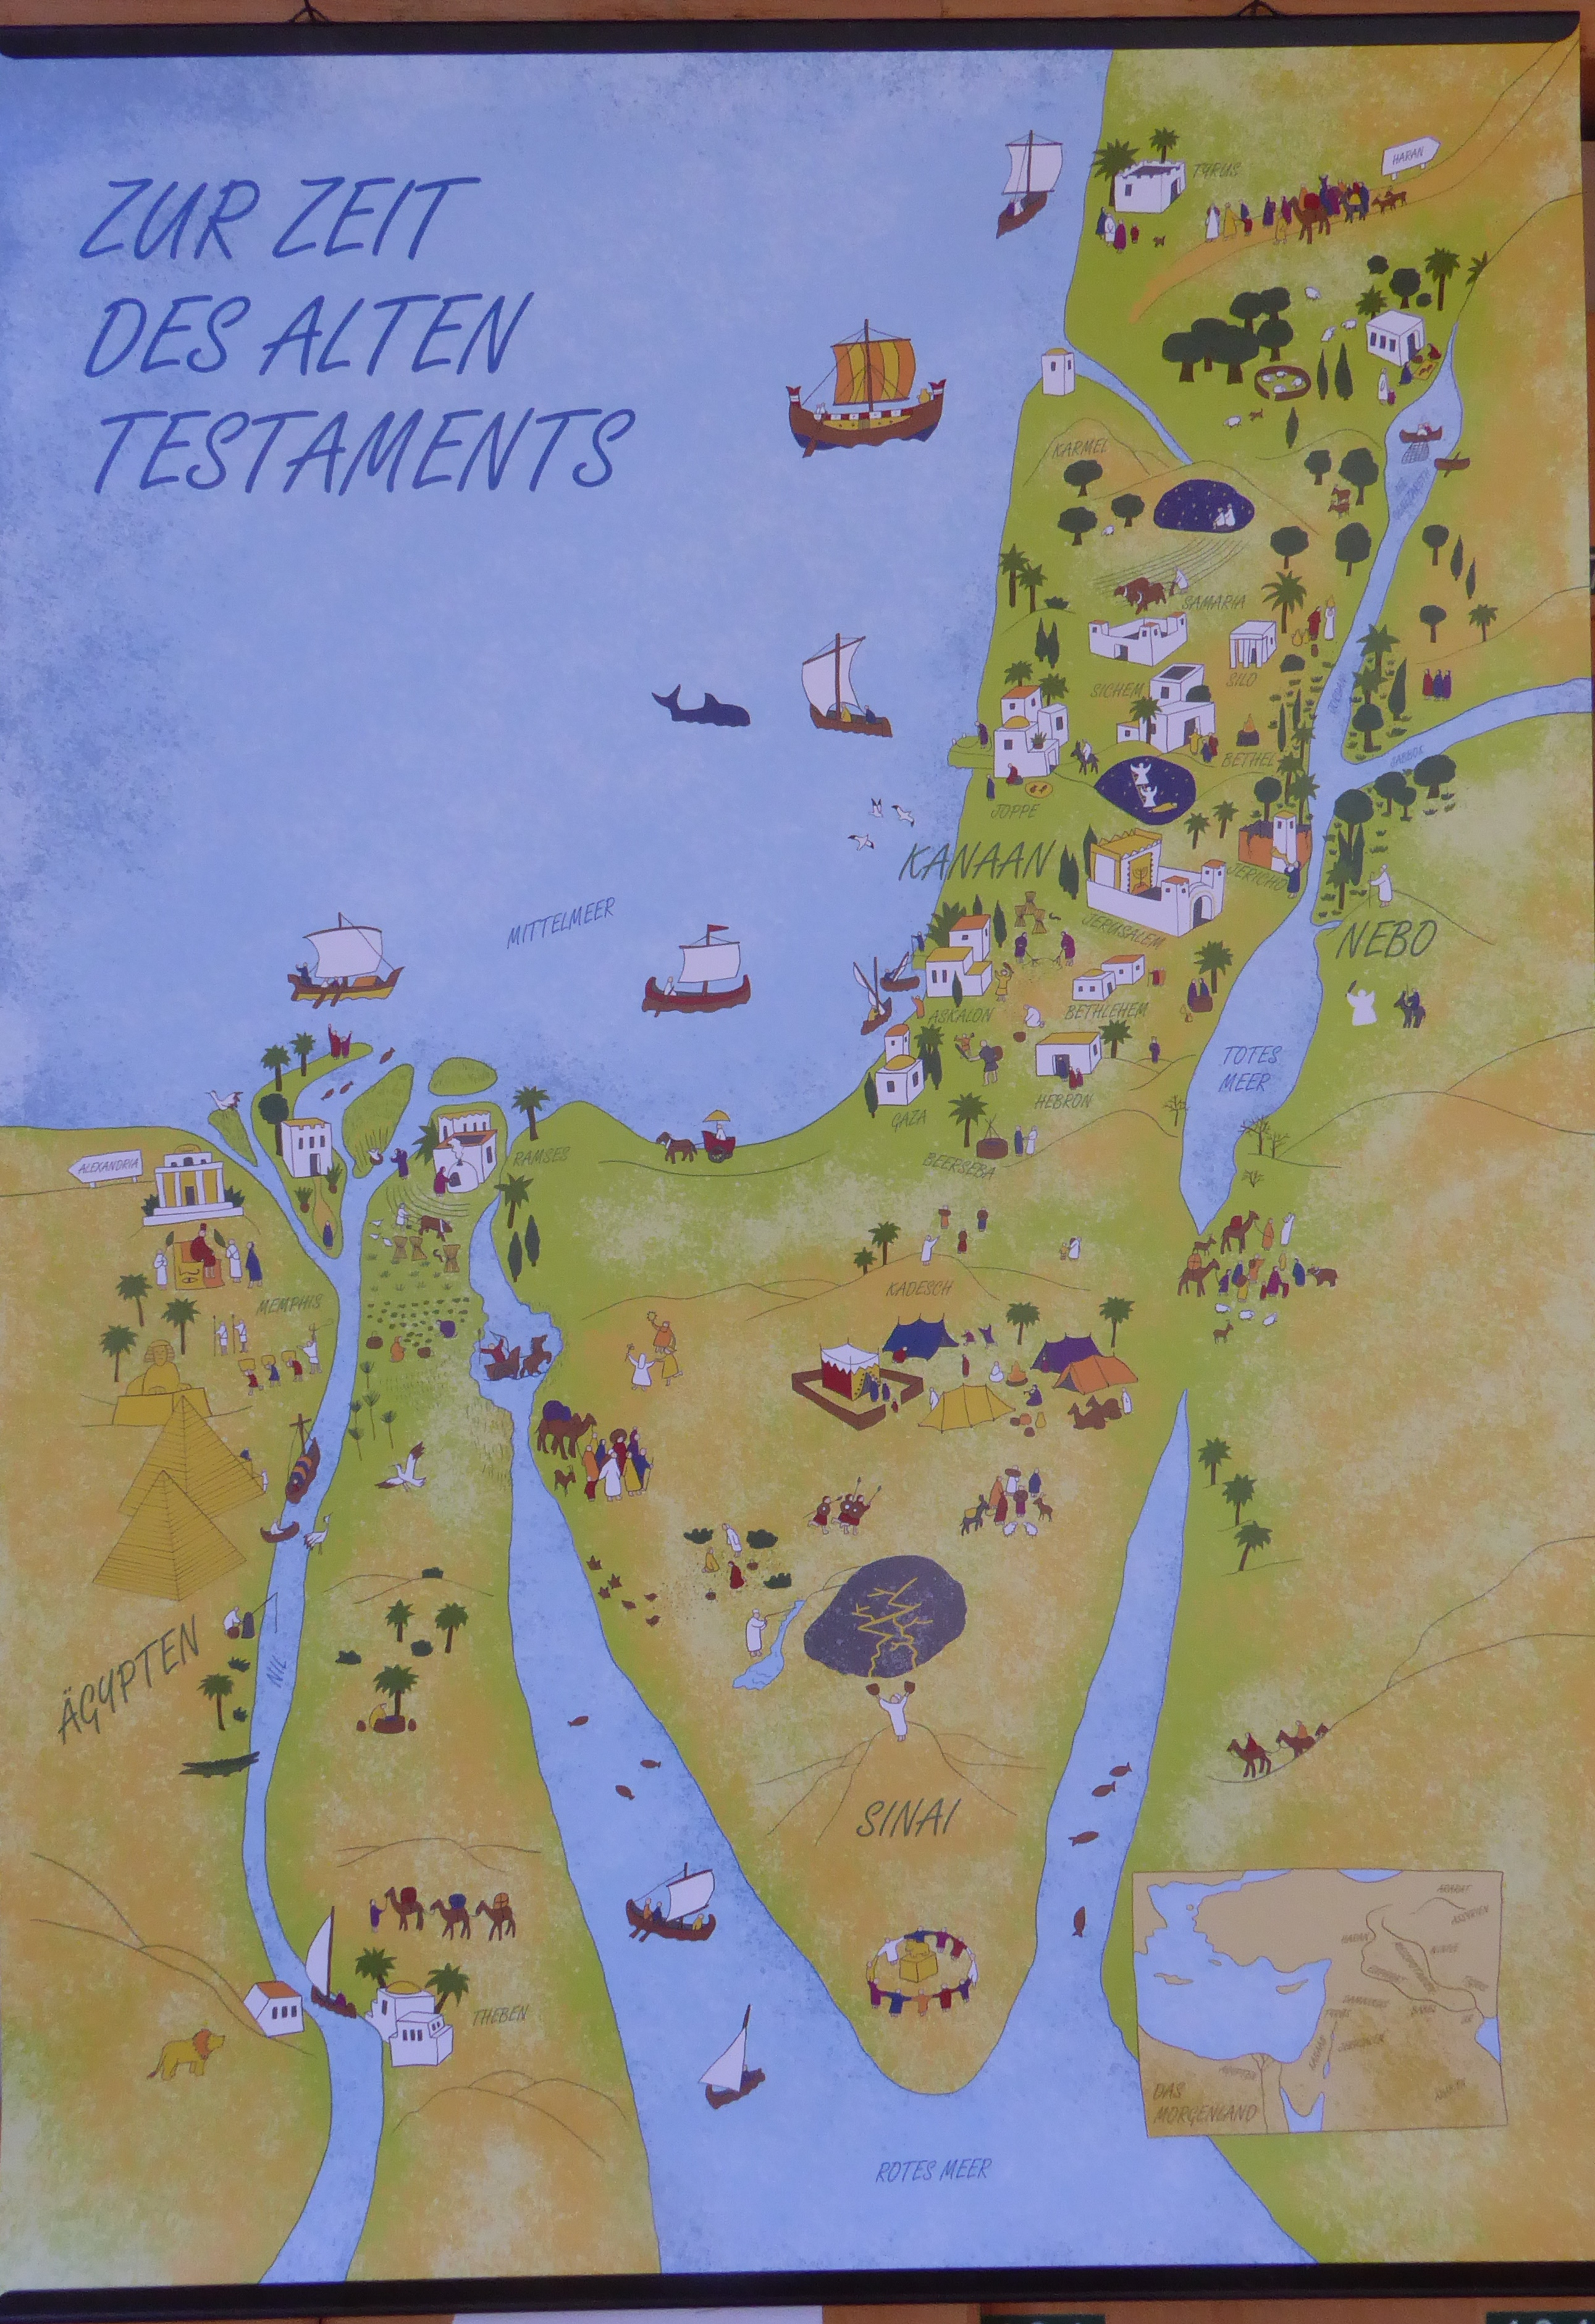 Testament altes landkarte israel Historische landkarte